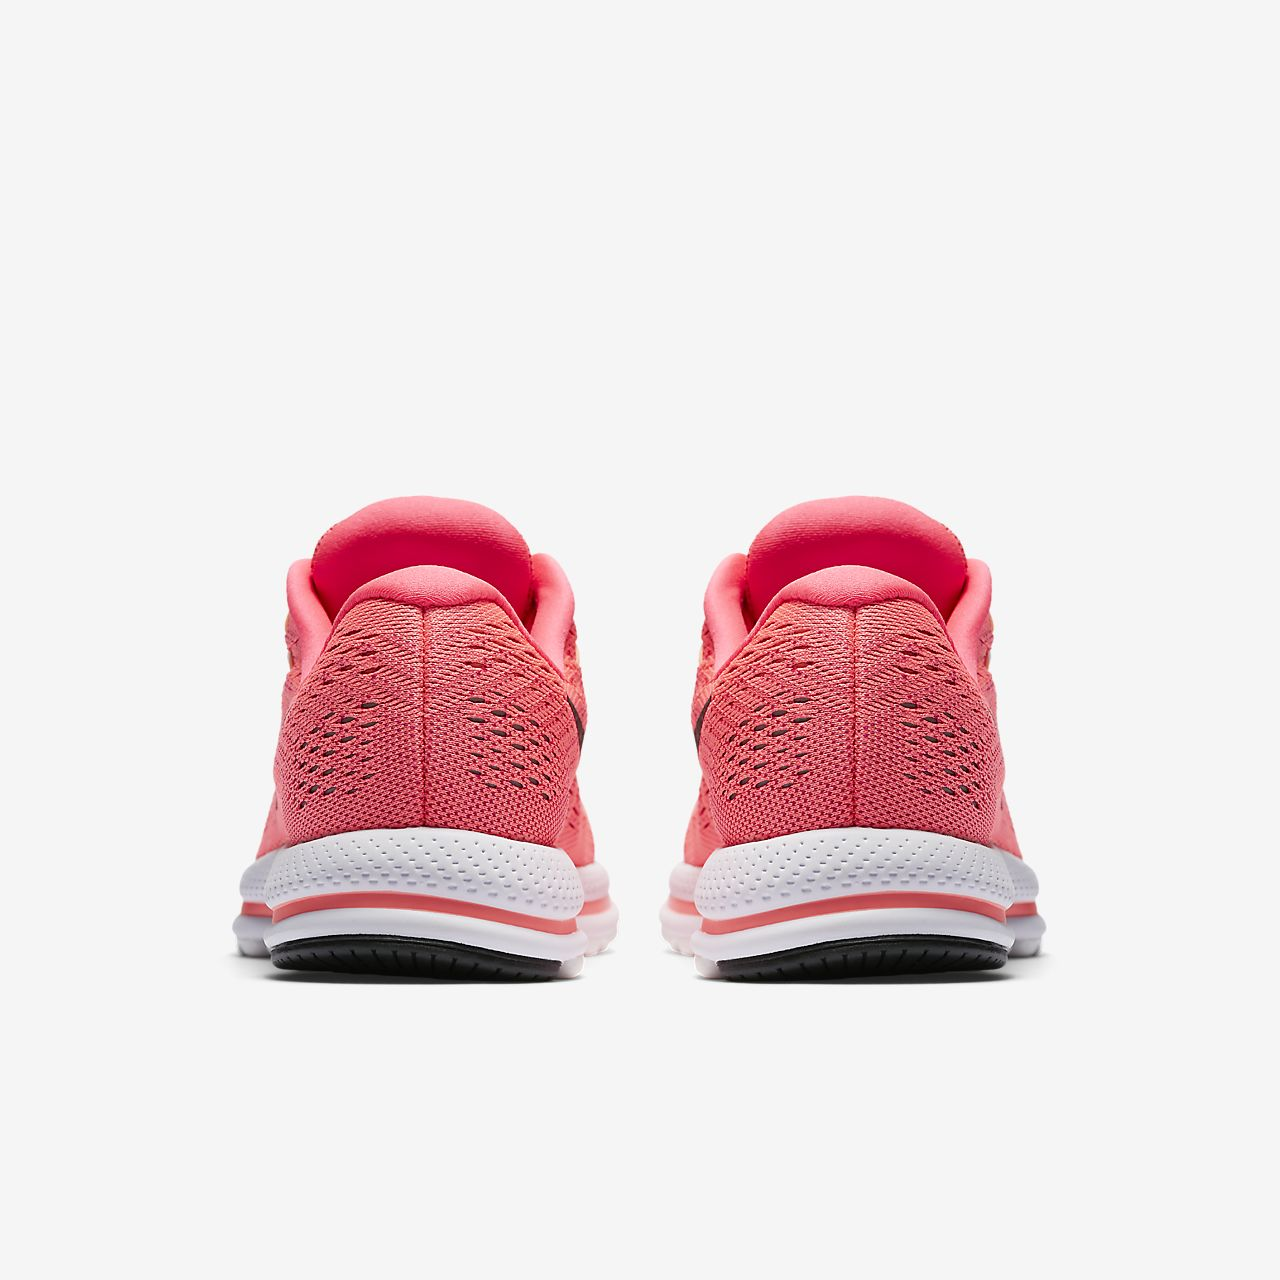 Wmns Nike Air Zoom Vomero 12 - Chaussures Pour Les Hommes / Gris Nike pgGRi